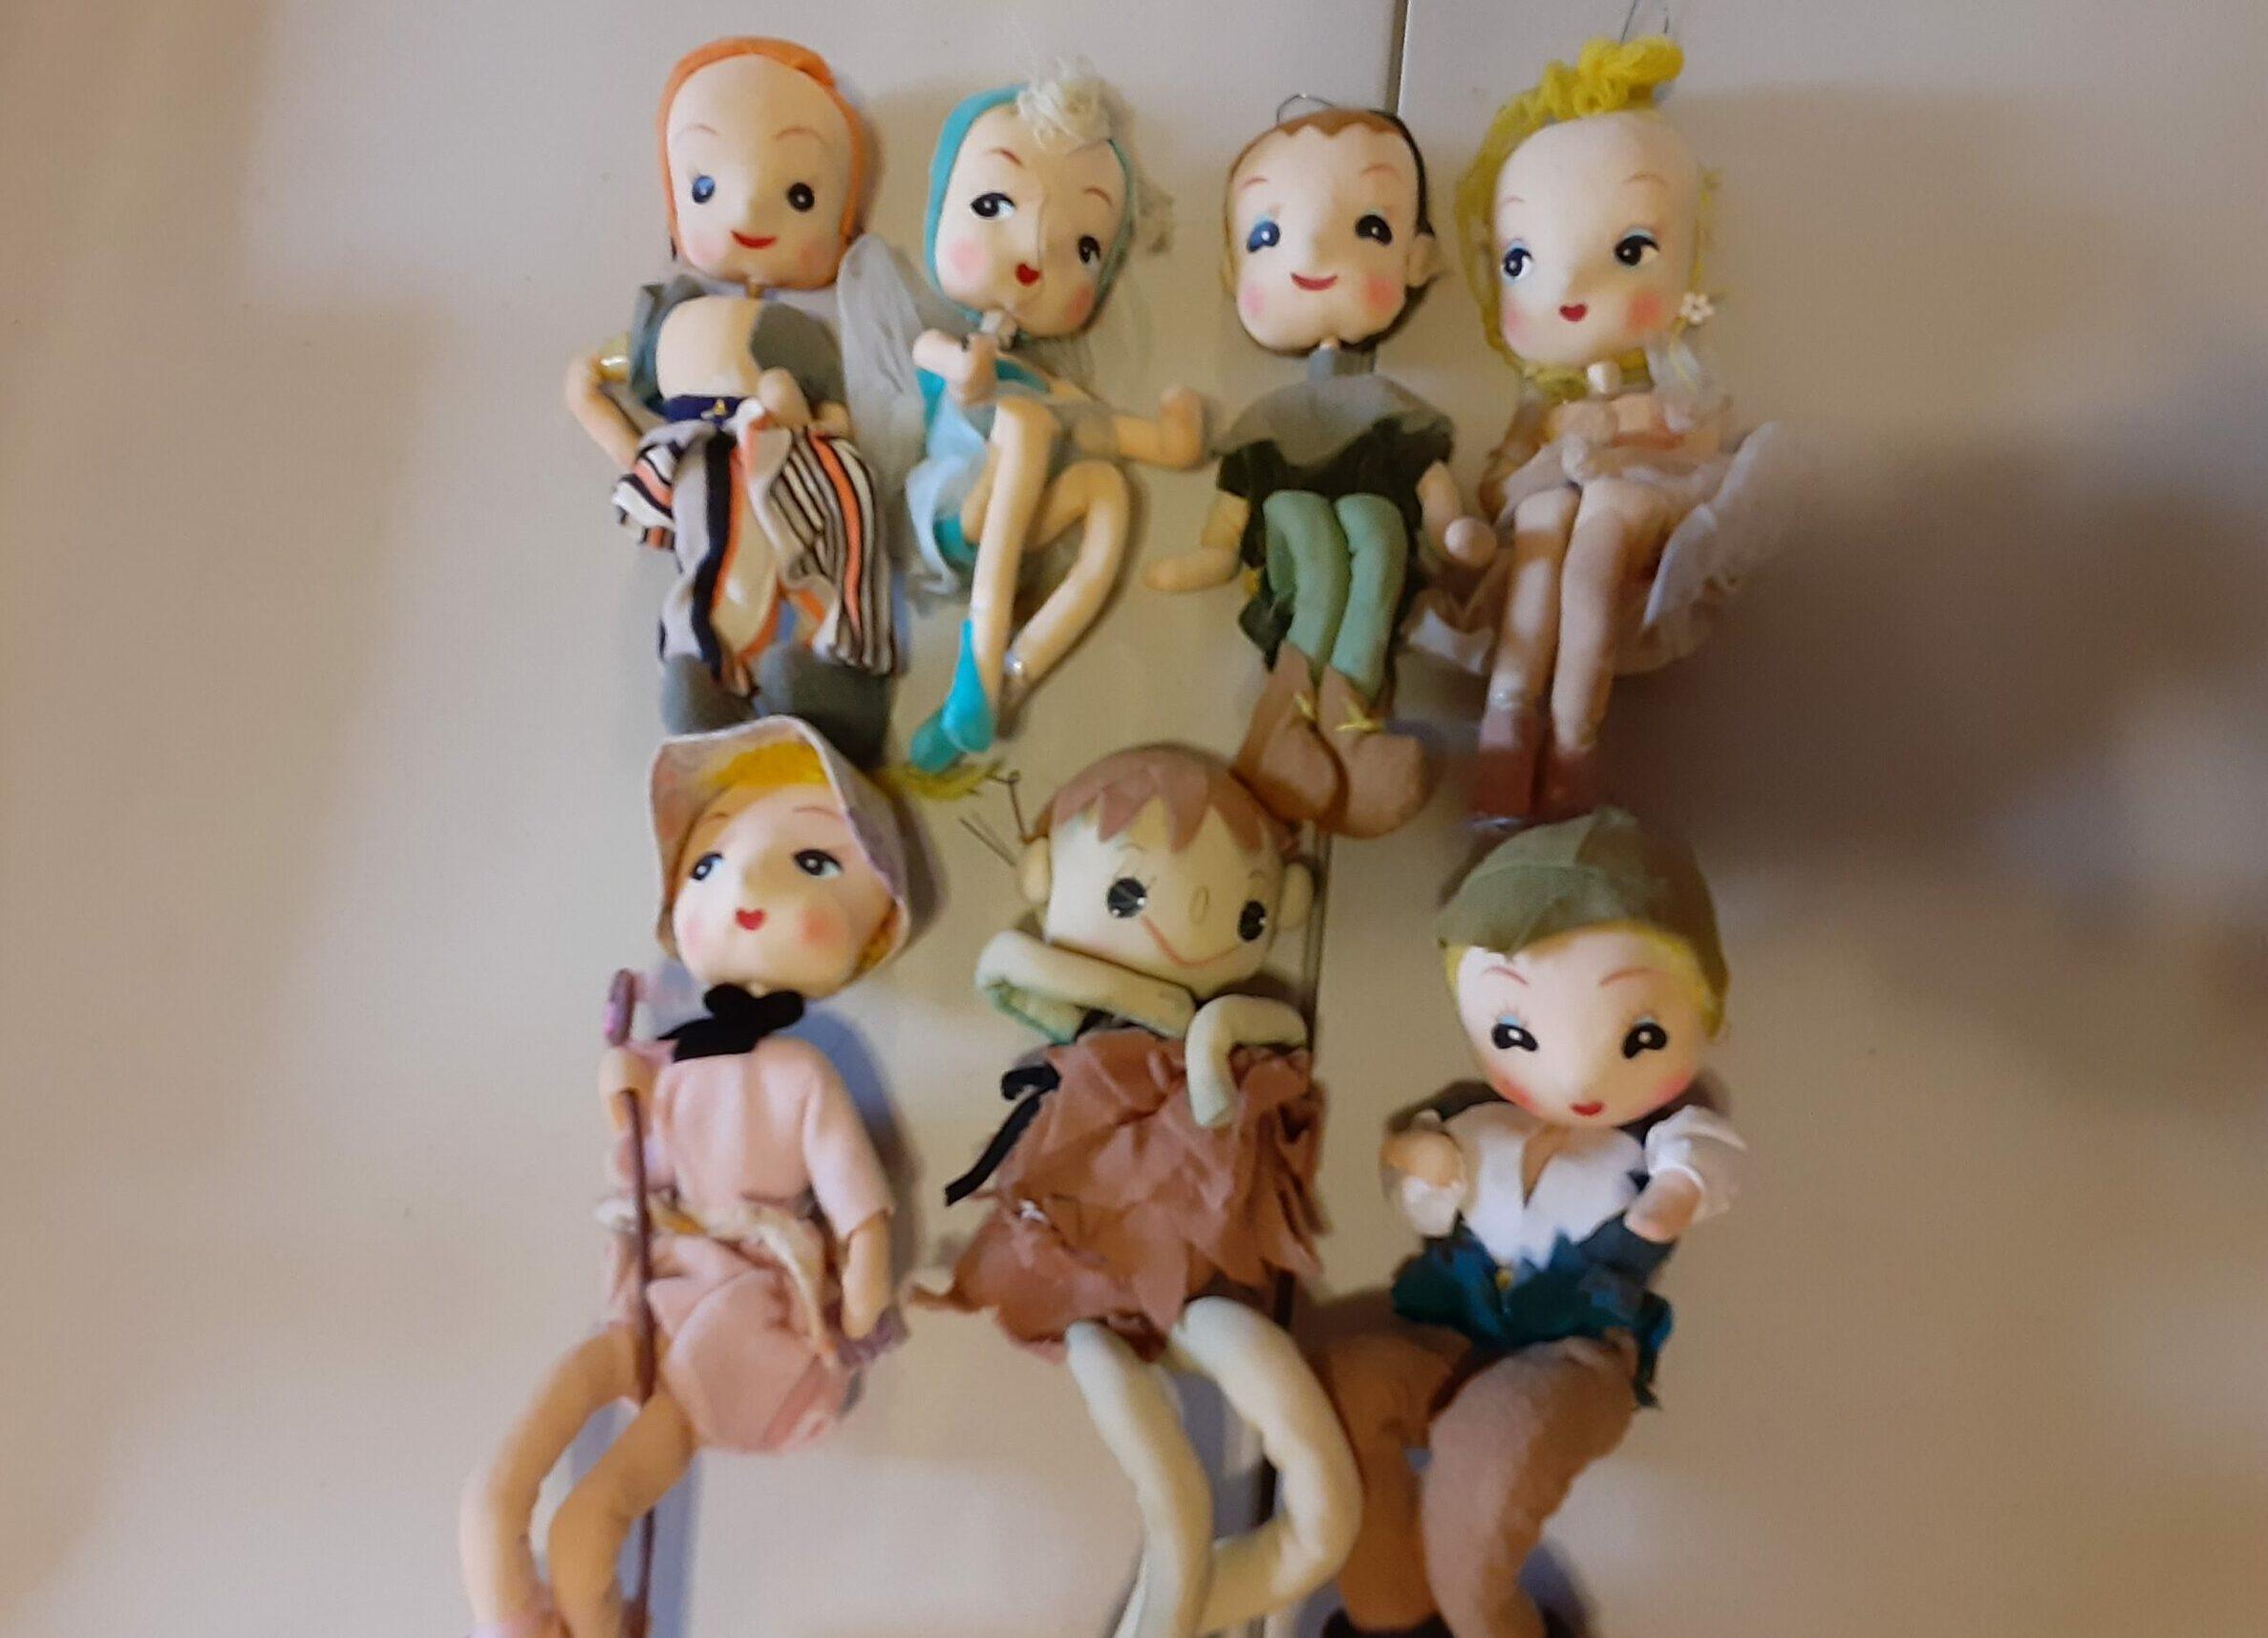 handmade Christmas ornament dolls from 1960s